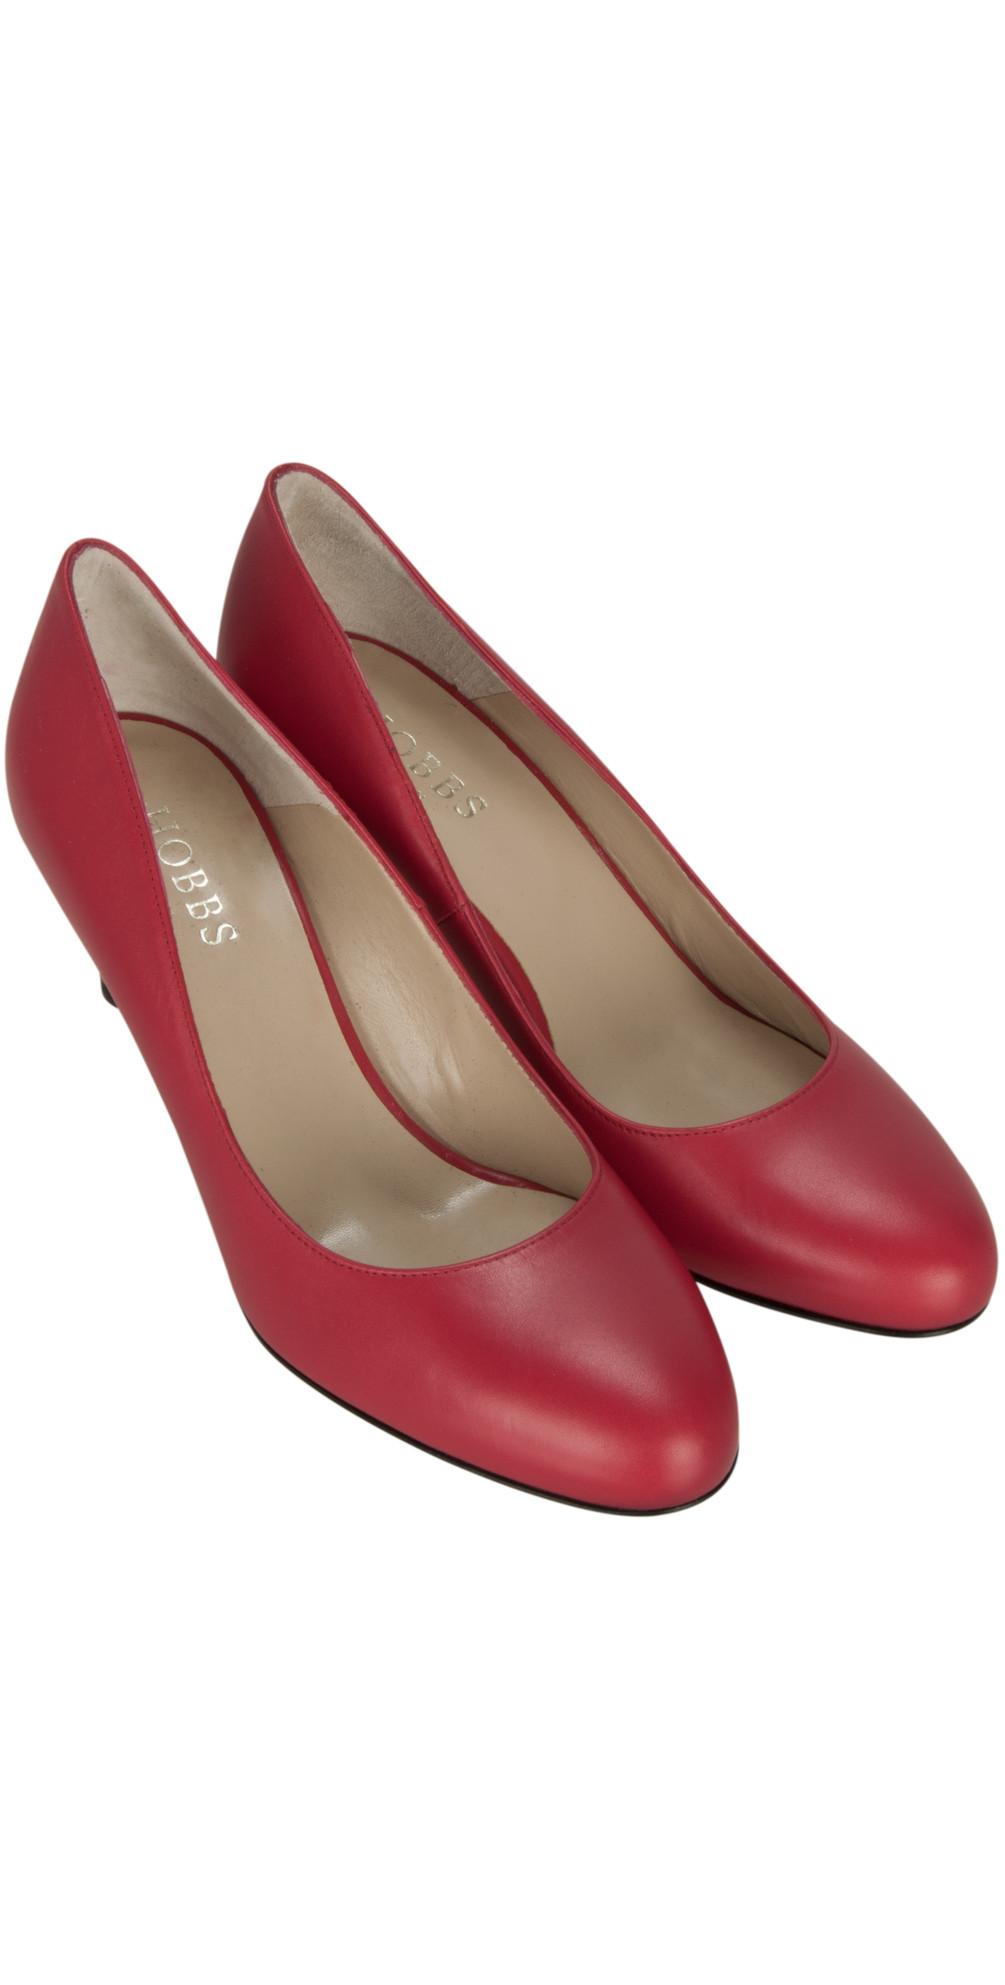 b3e02c498 HOBBS Lizzie Court Shoe in Rose